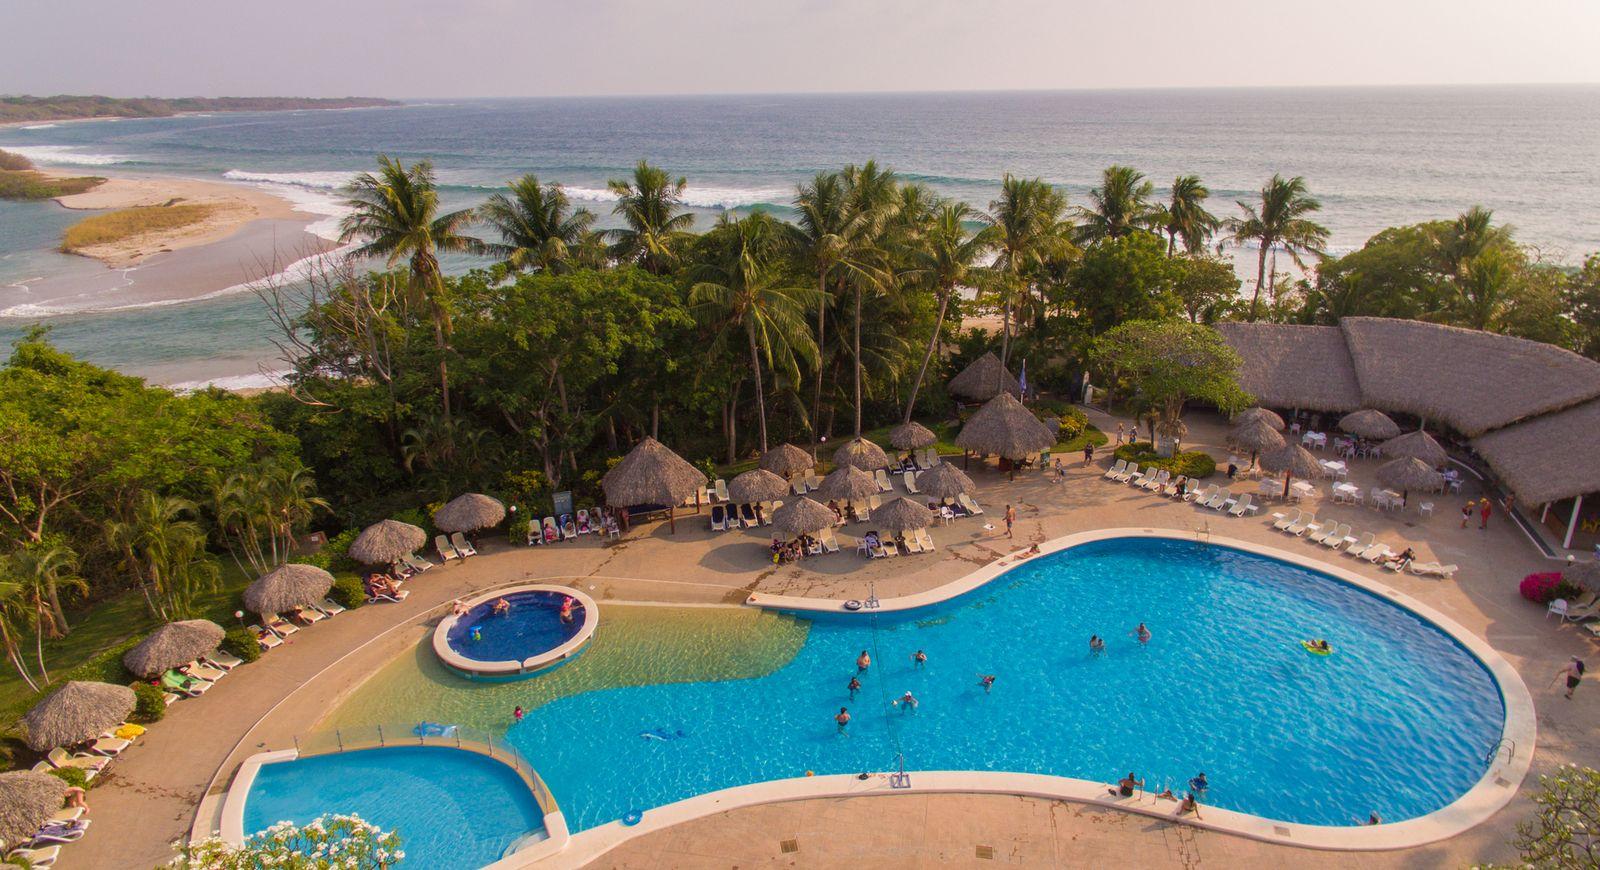 Barcelo Hotel Playa Langosta